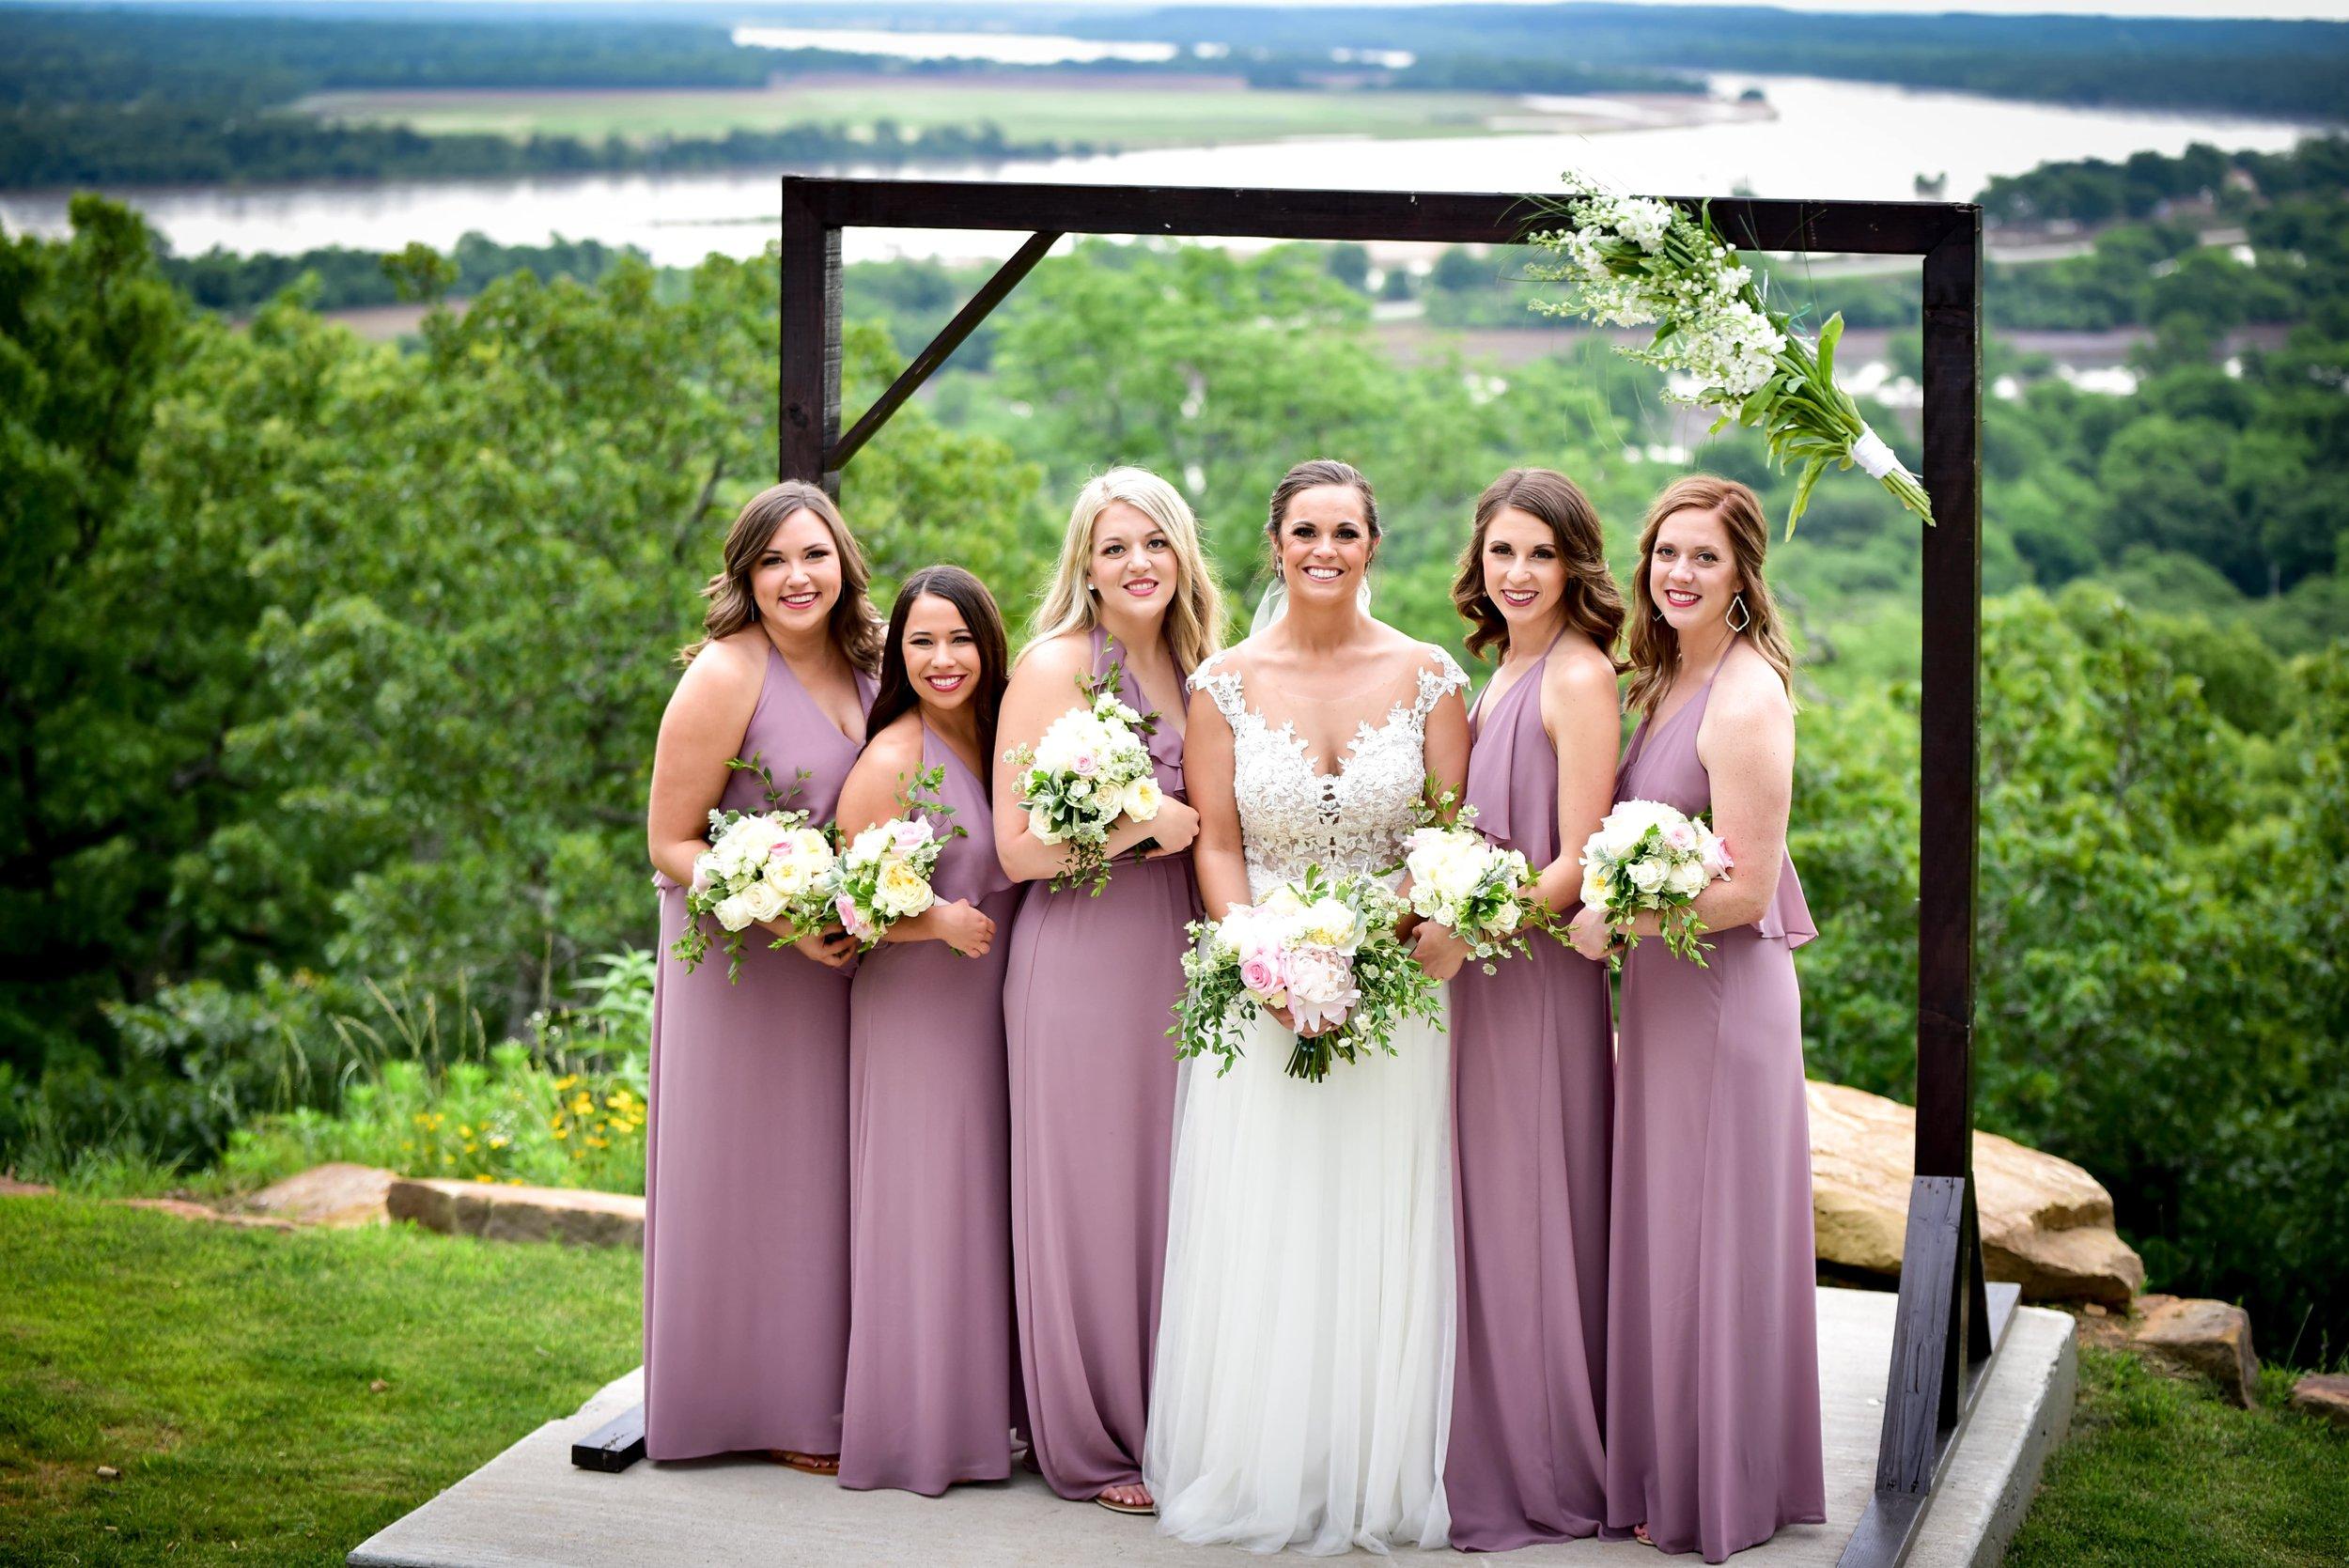 Modern Bright Light White Tulsa Wedding Venue 23-min.jpg